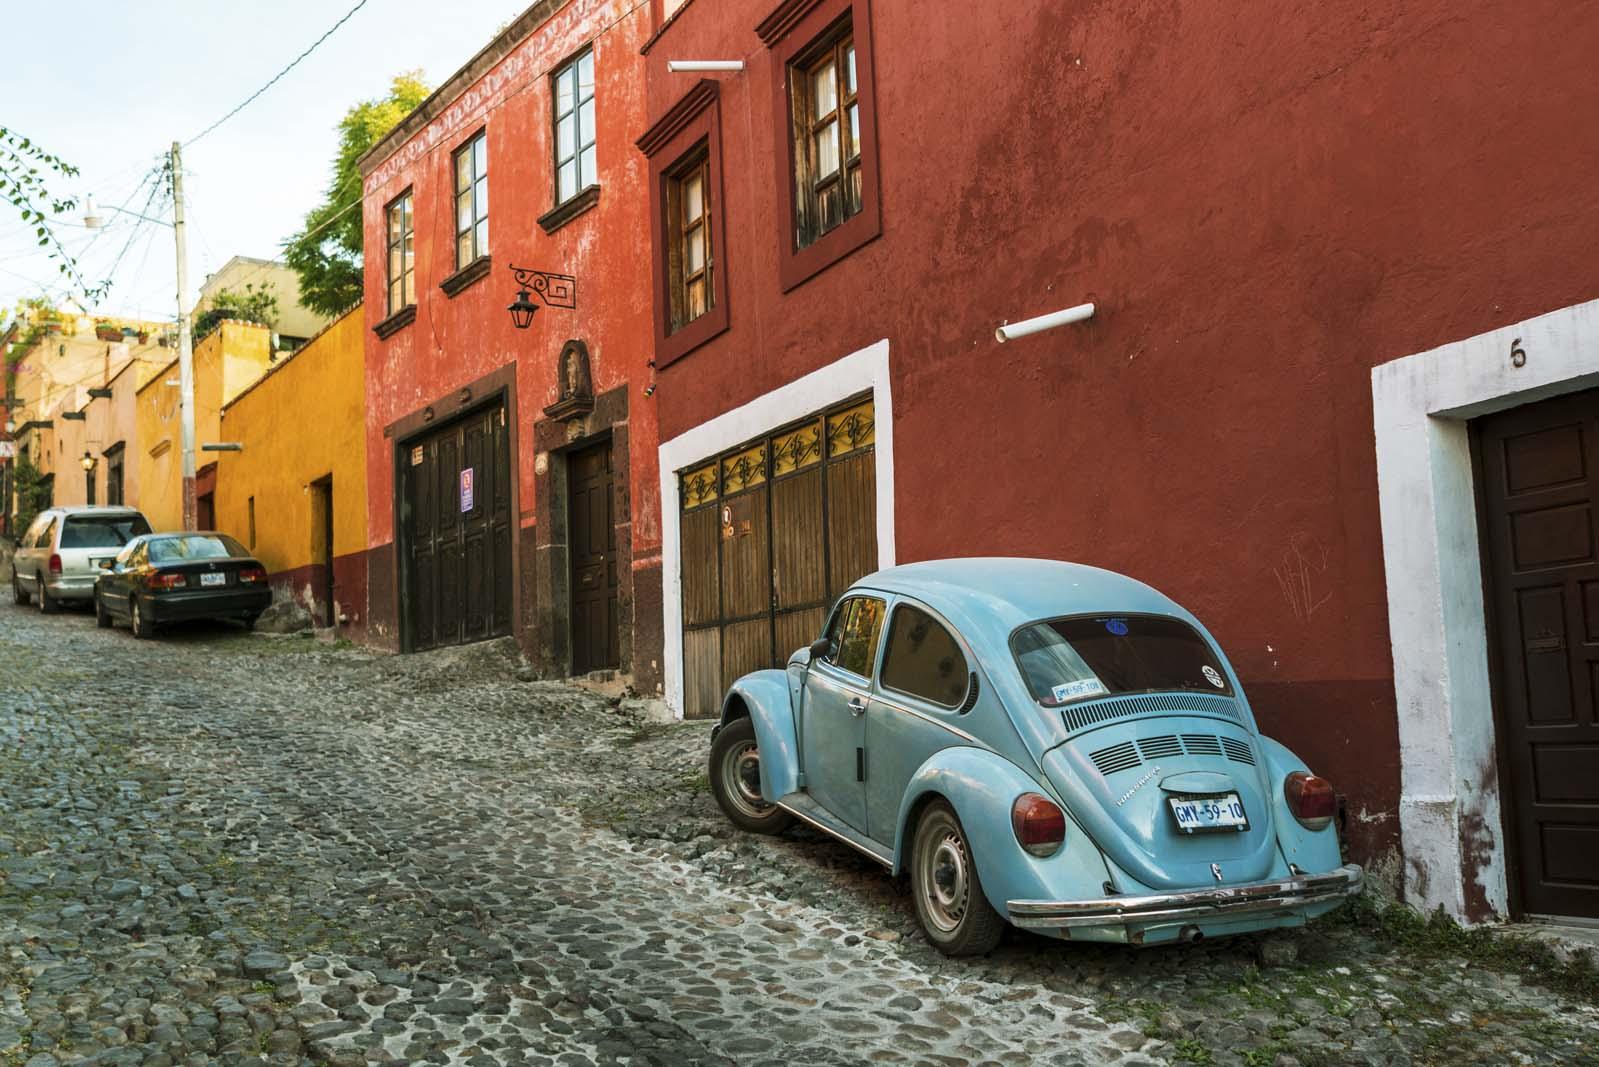 Another beautiful street view of San Miguel de Allende